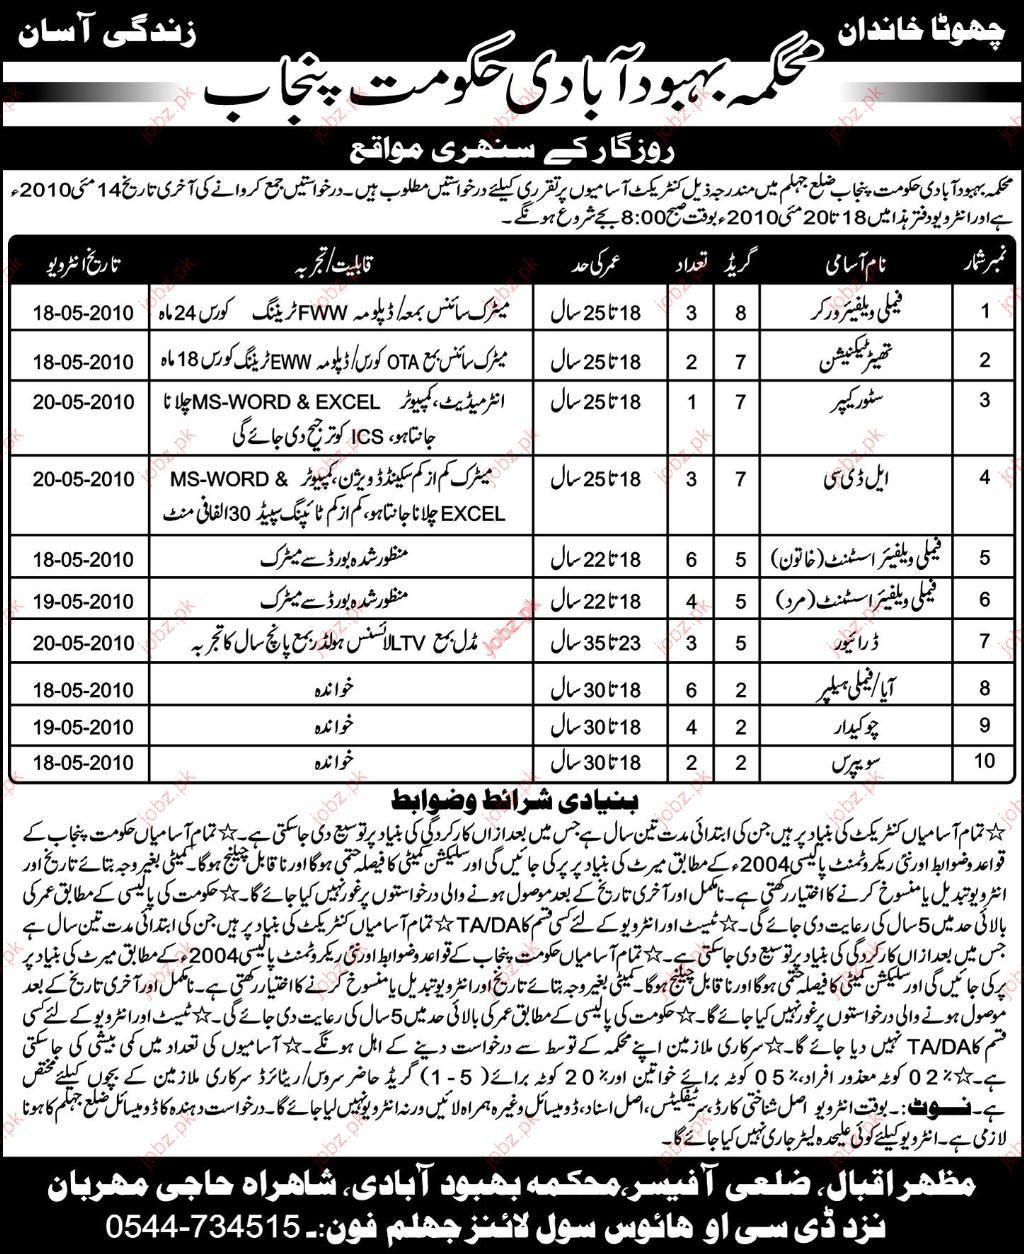 Staff Required in Population Welfare Deptt of Punjab